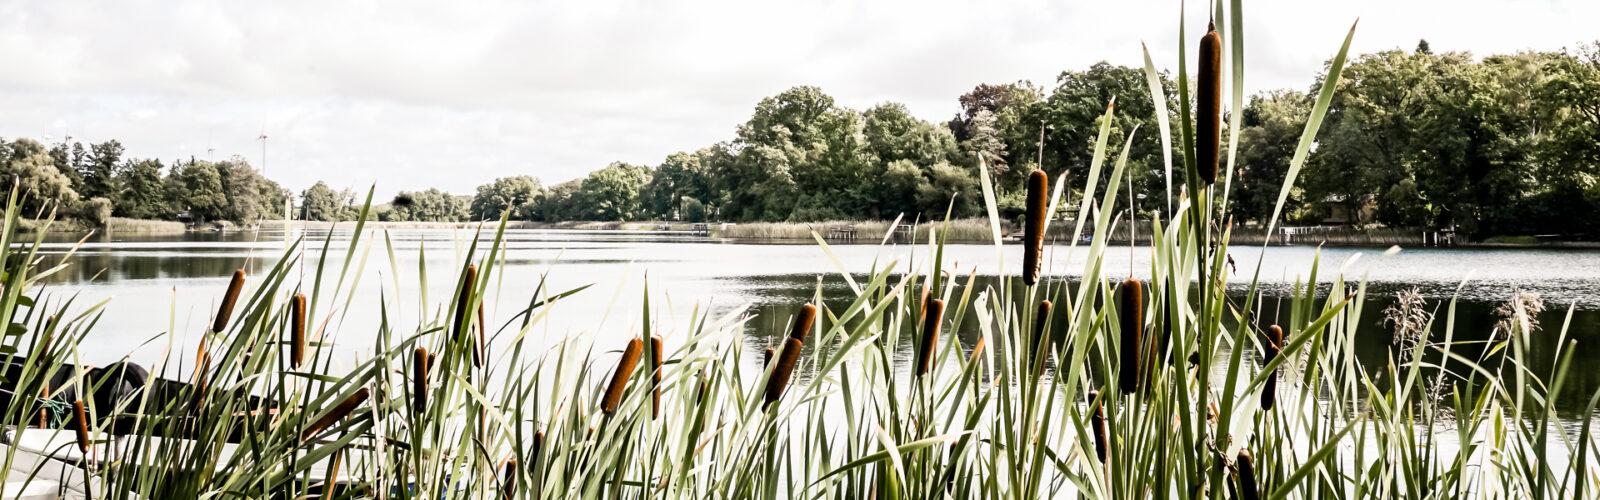 Tourismusverein Naturpark Barnim e. V.